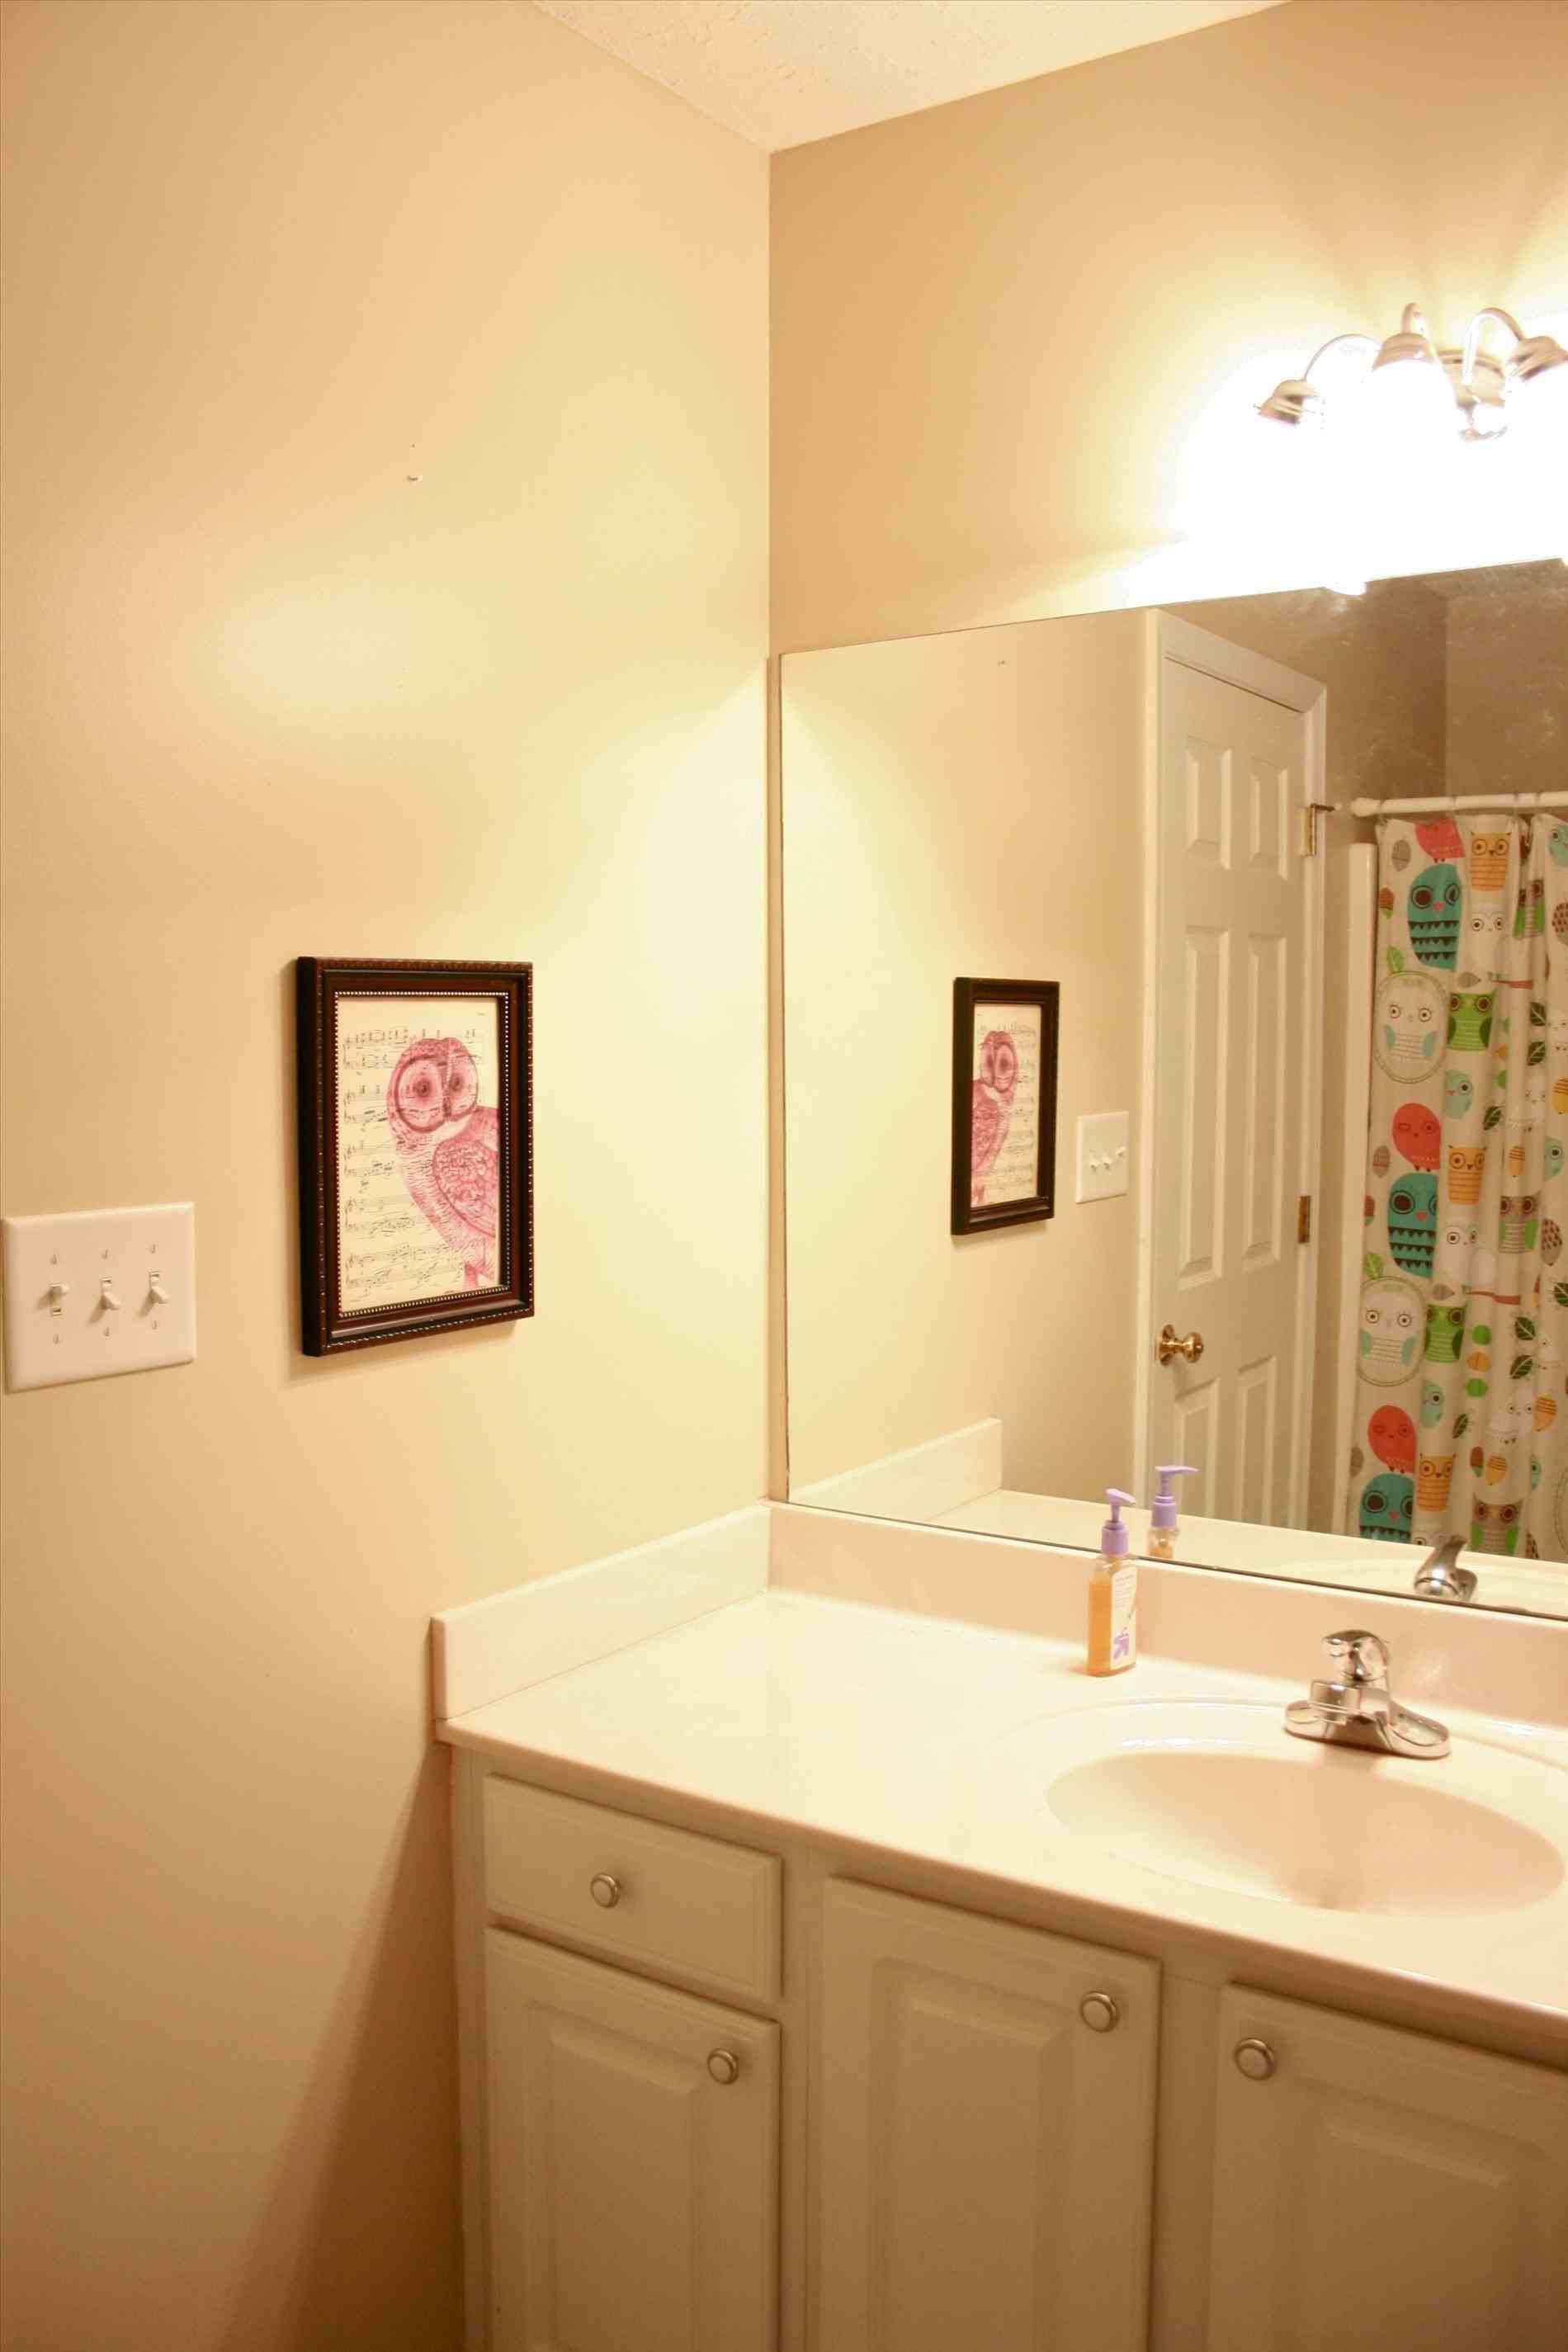 Fantastic Bathroom Wall Decor Target Motif - Wall Art Collections ...